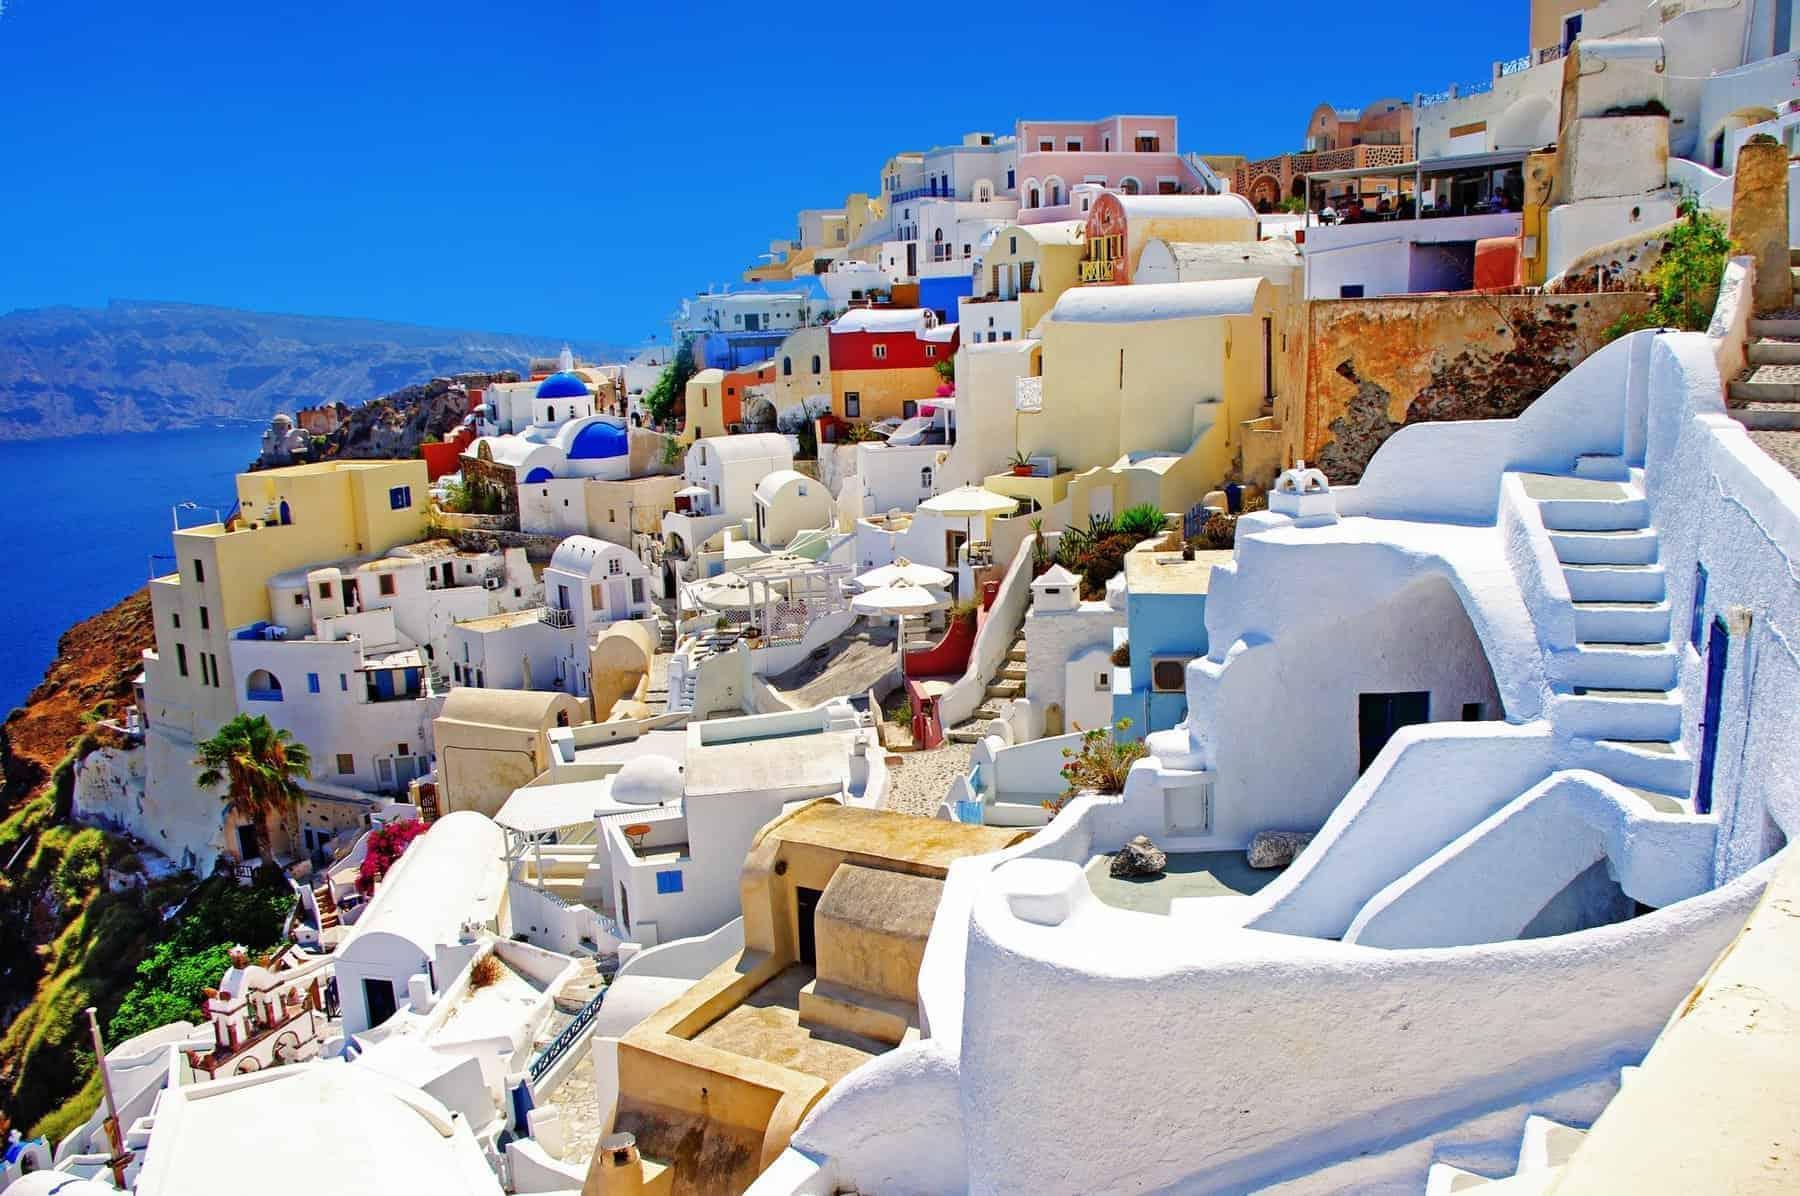 Santorini, a beautiful town on a cliff, Greece